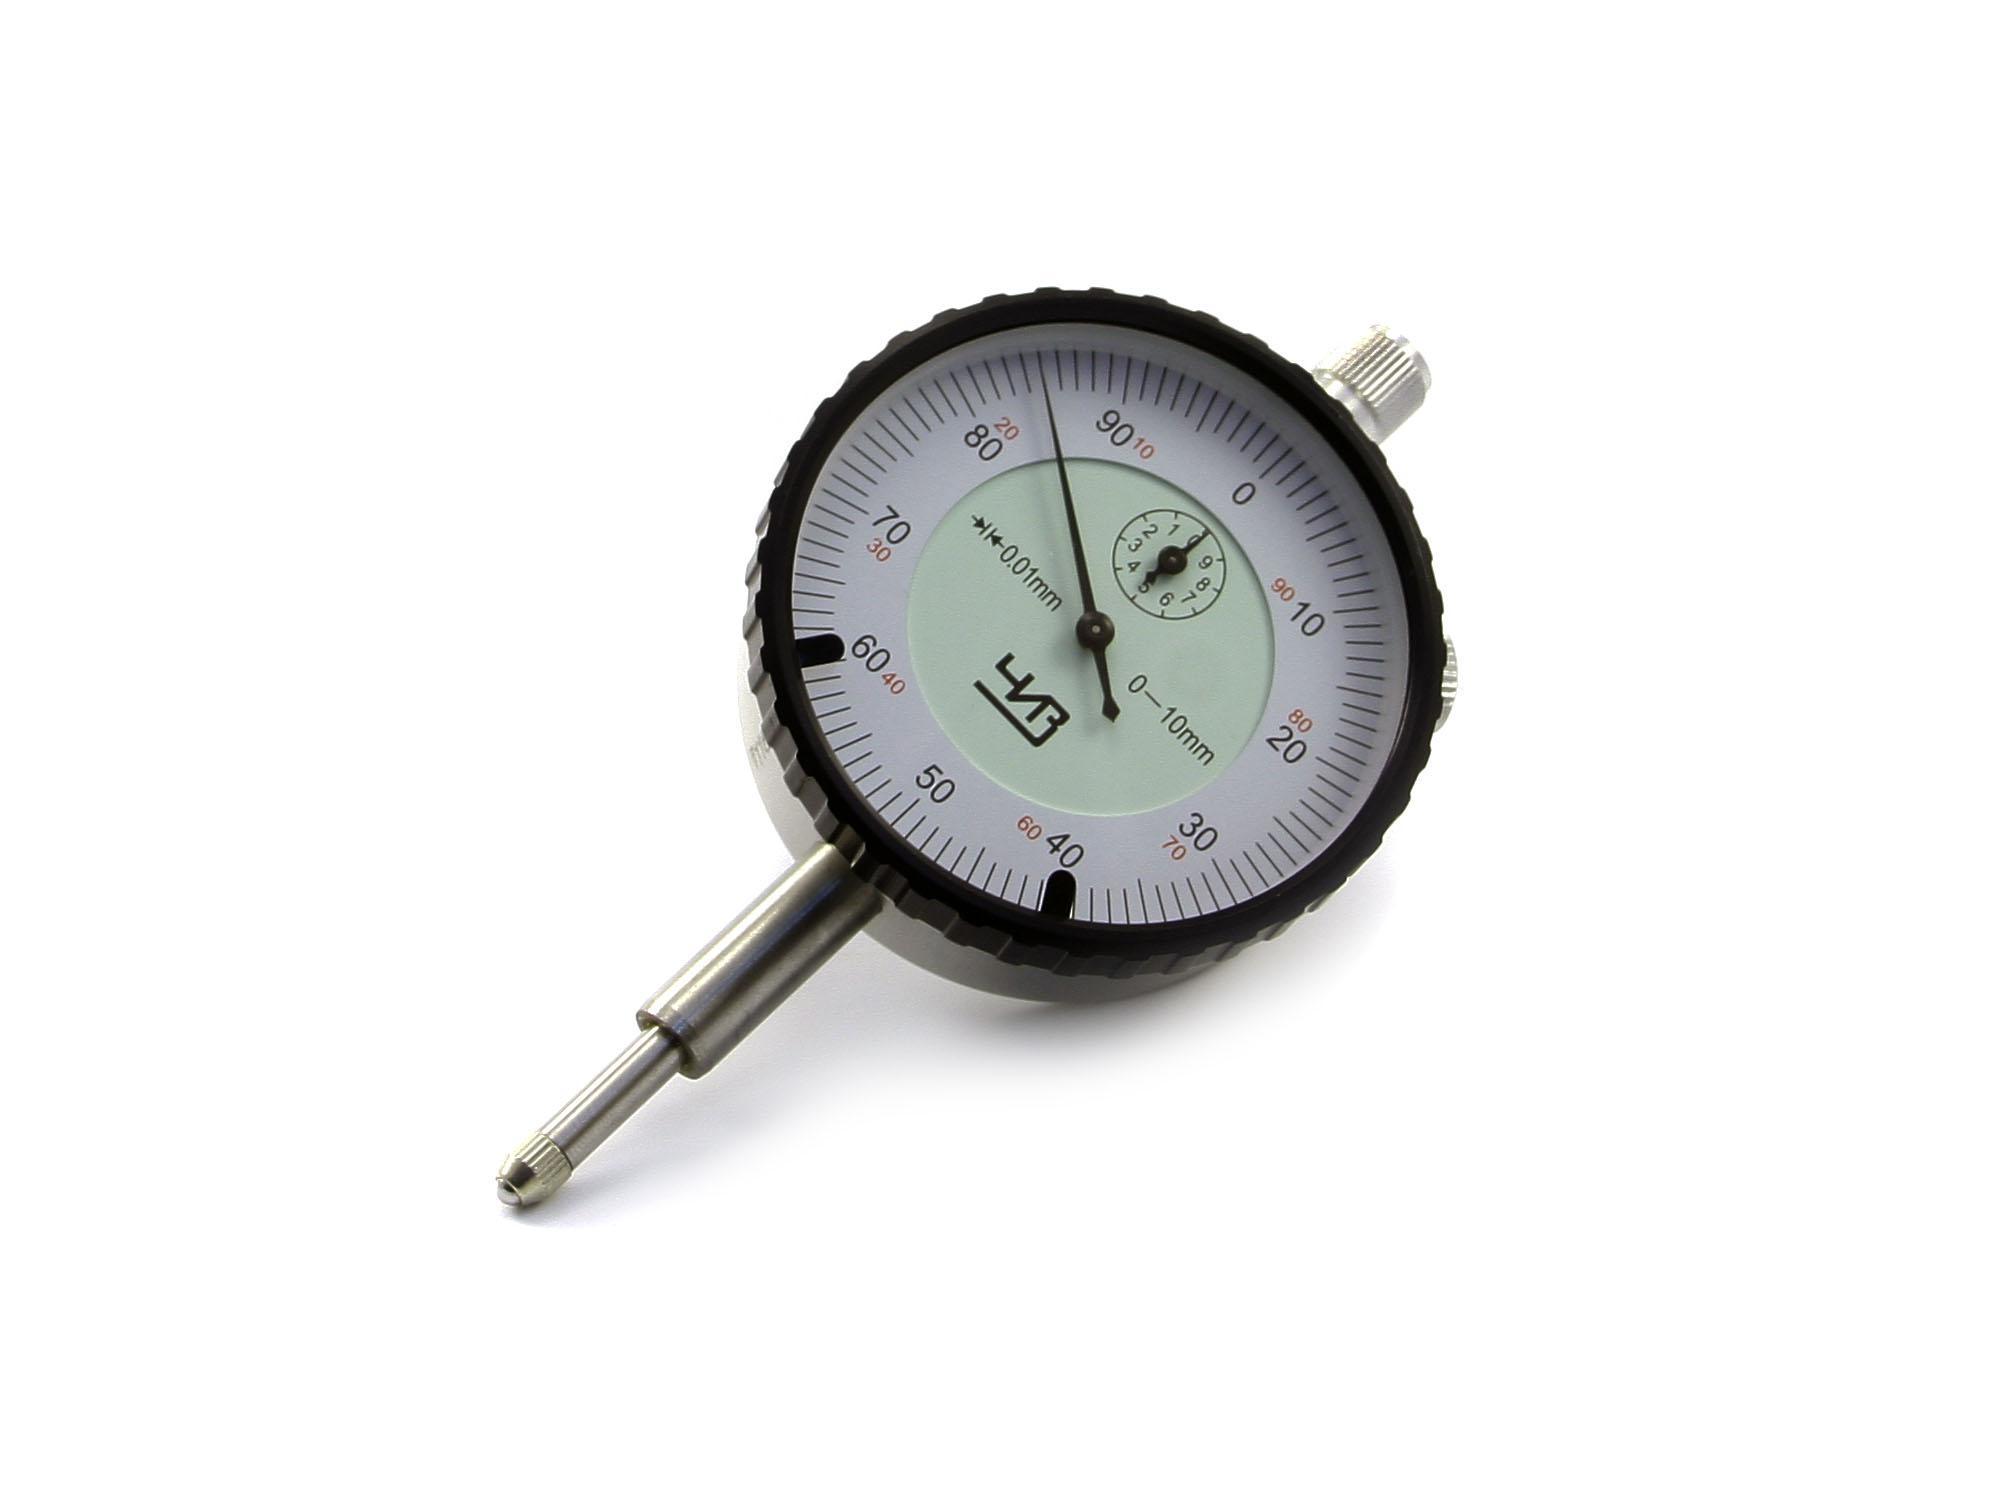 Индикатор ЧИЗ час.типа 0- 1 0.001 б/уш.